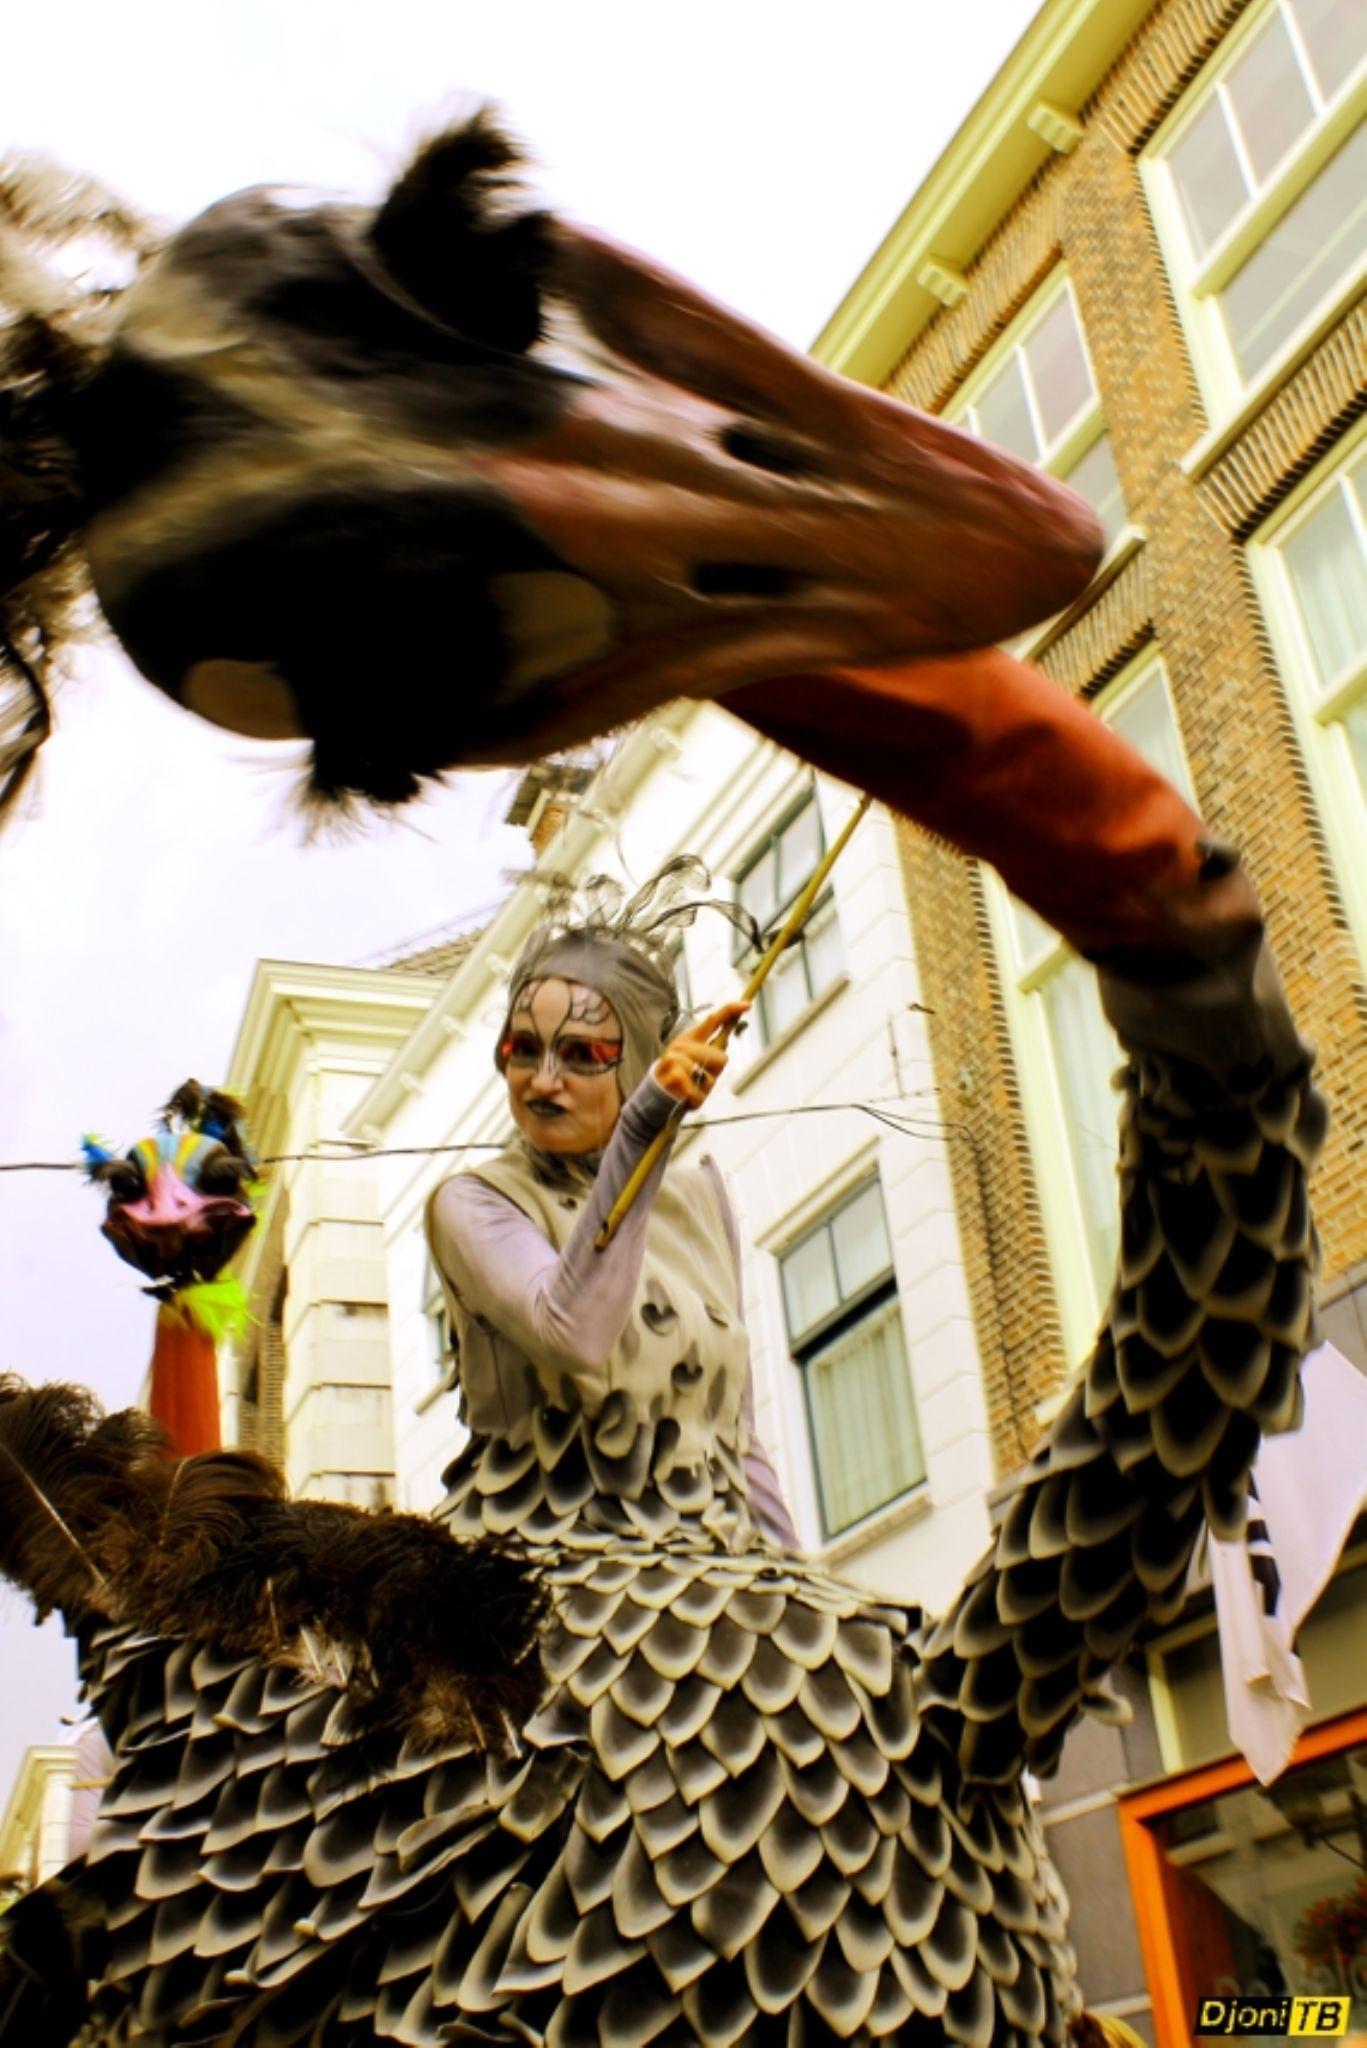 Schiedam brandersfeesten by Djoni TB Photography